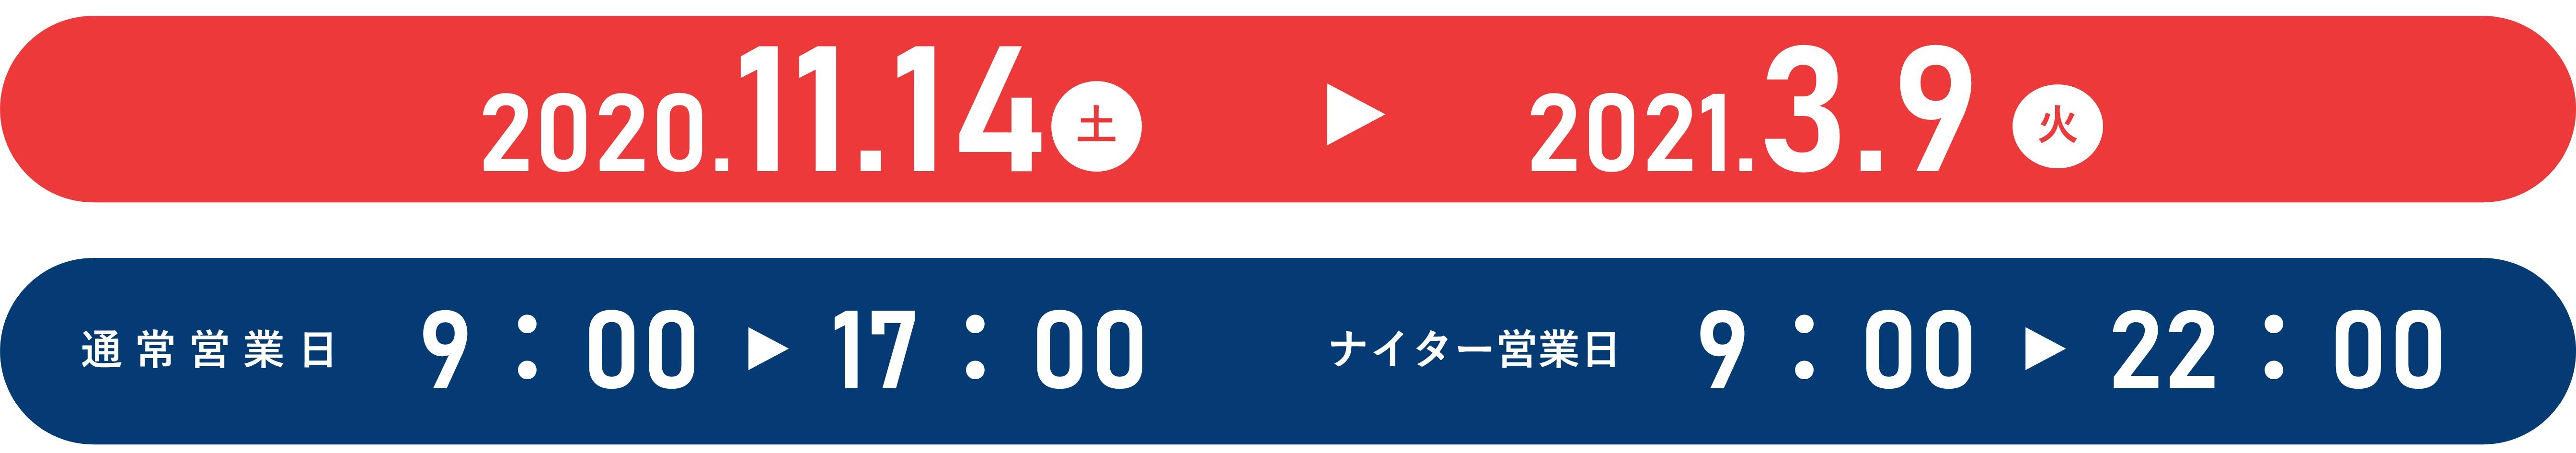 2020.11.14 土 〜 2021.3.9 日 通常営業日 9:00〜17:00 ナイター営業日 9:00〜22:00